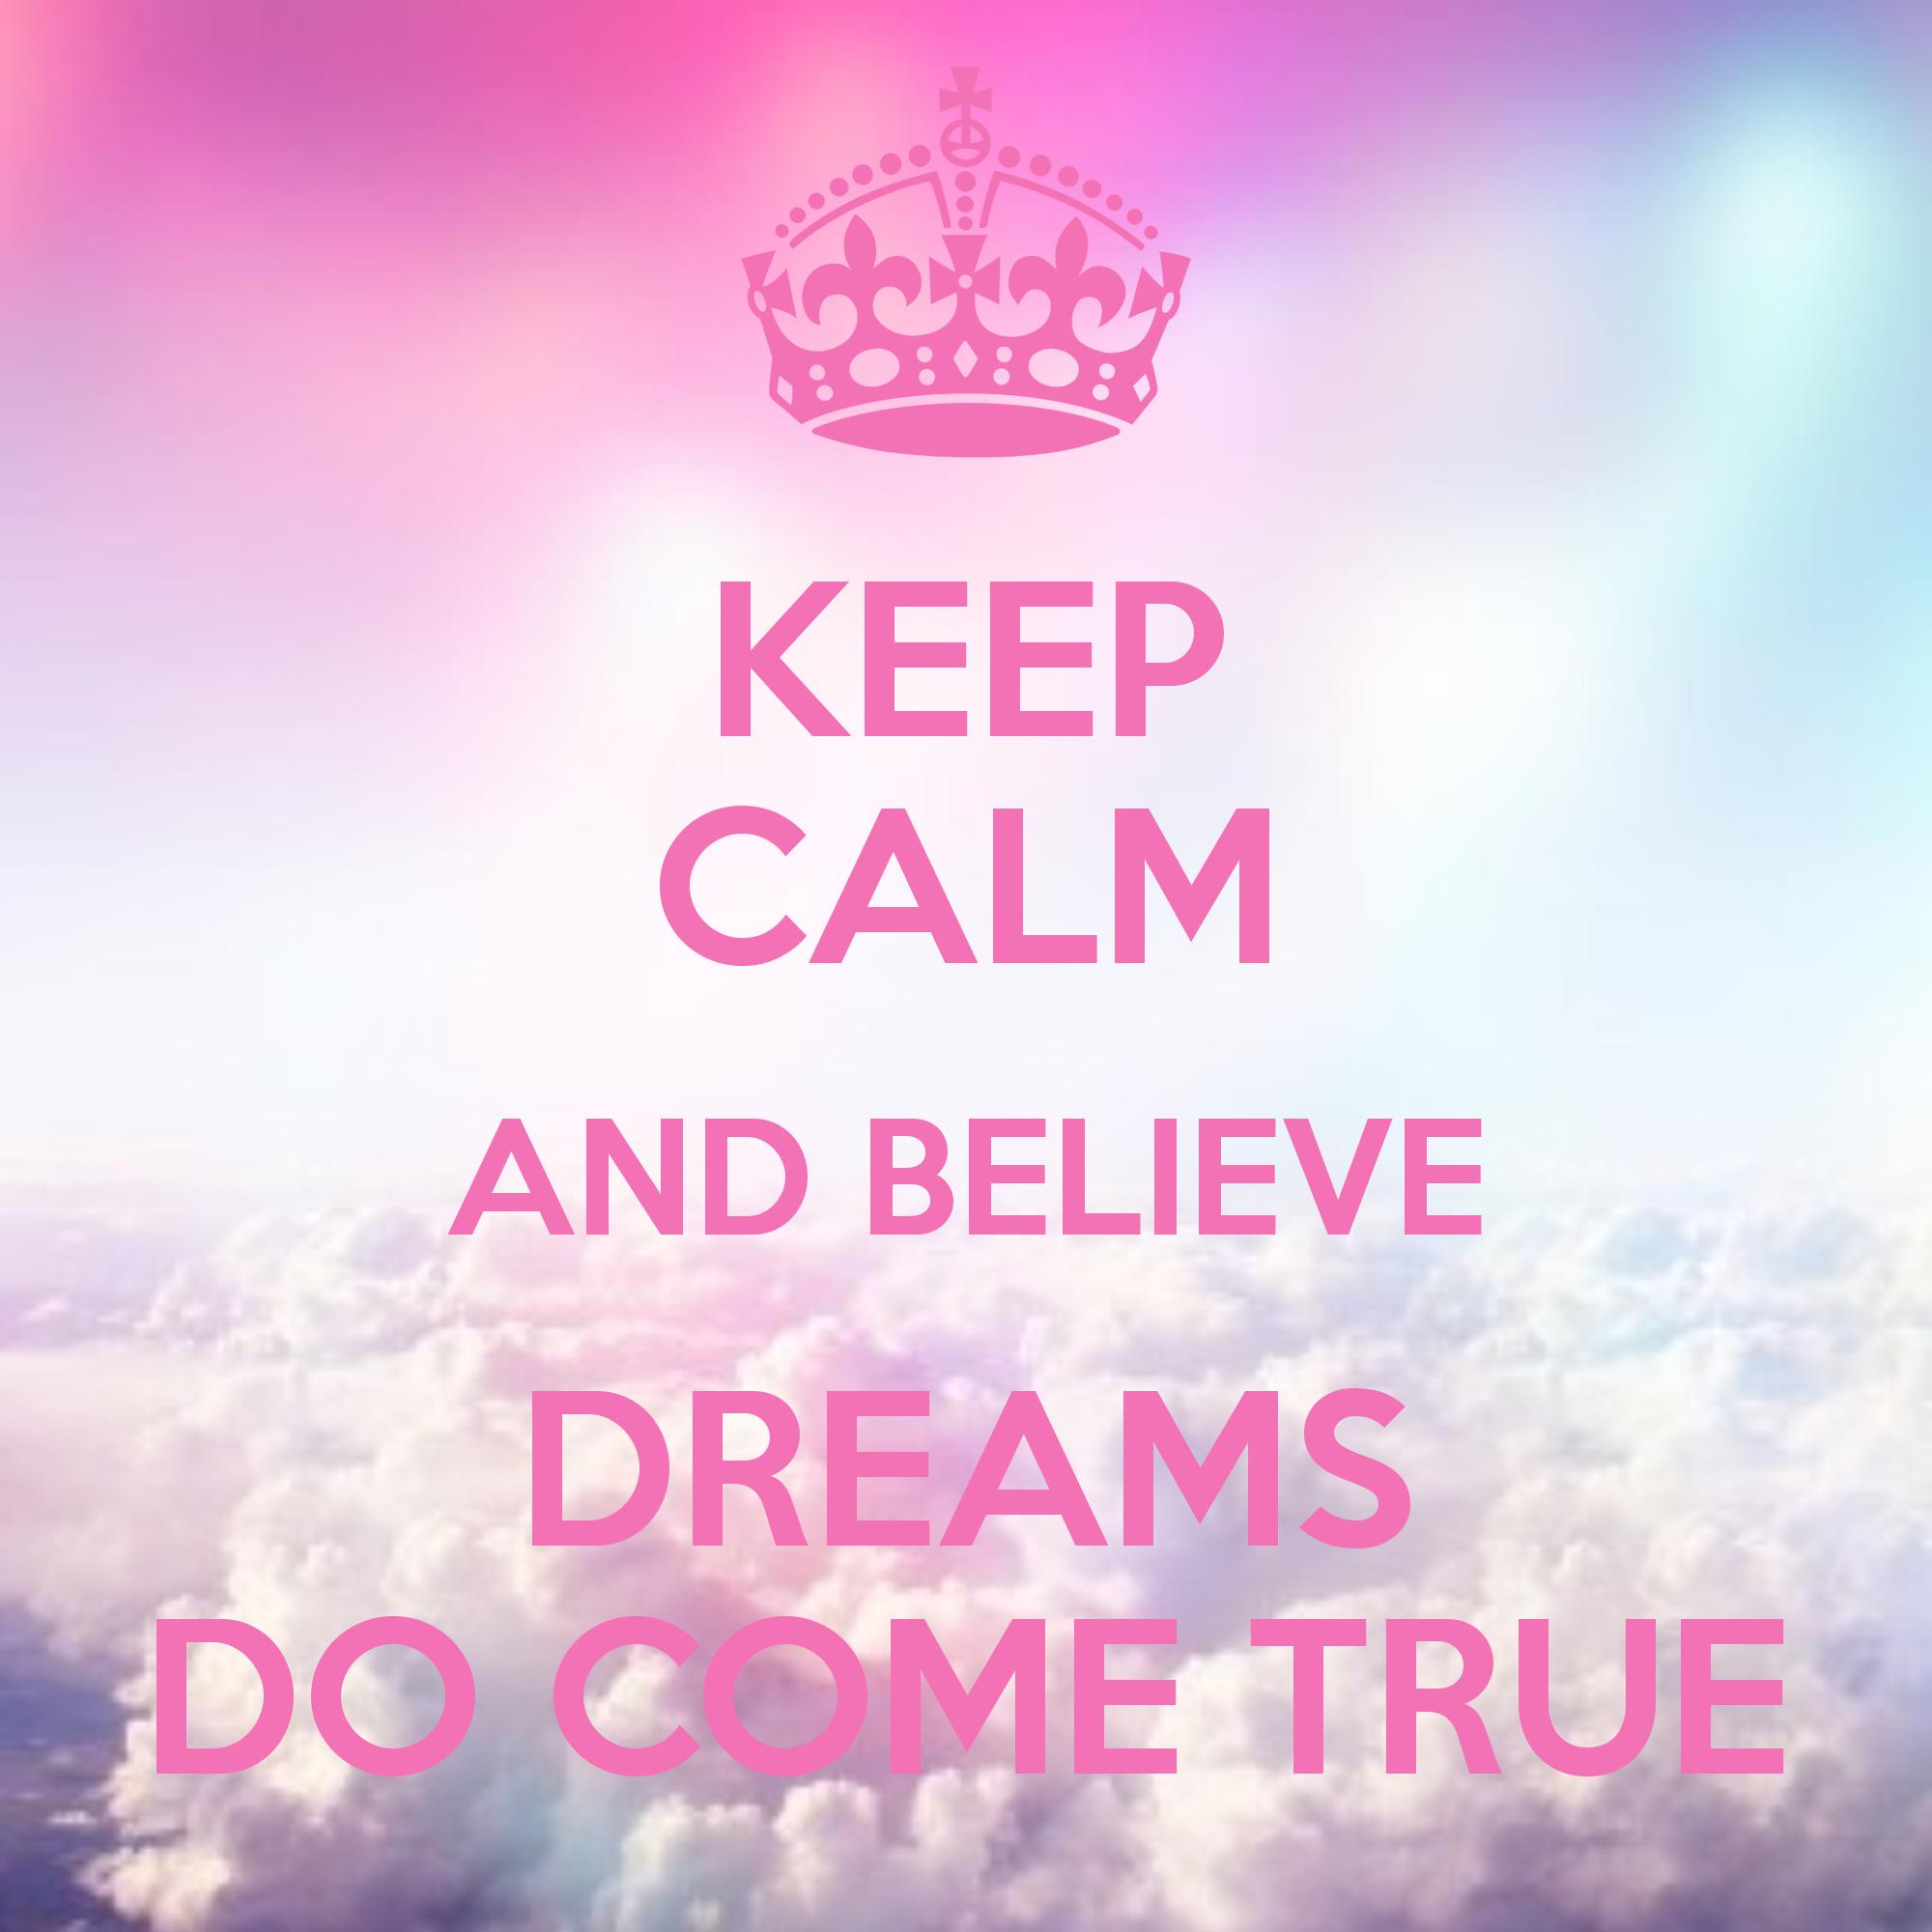 At kth dreams do come true daniel ddiba dreams come true quotes wallpaper 2 thecheapjerseys Gallery